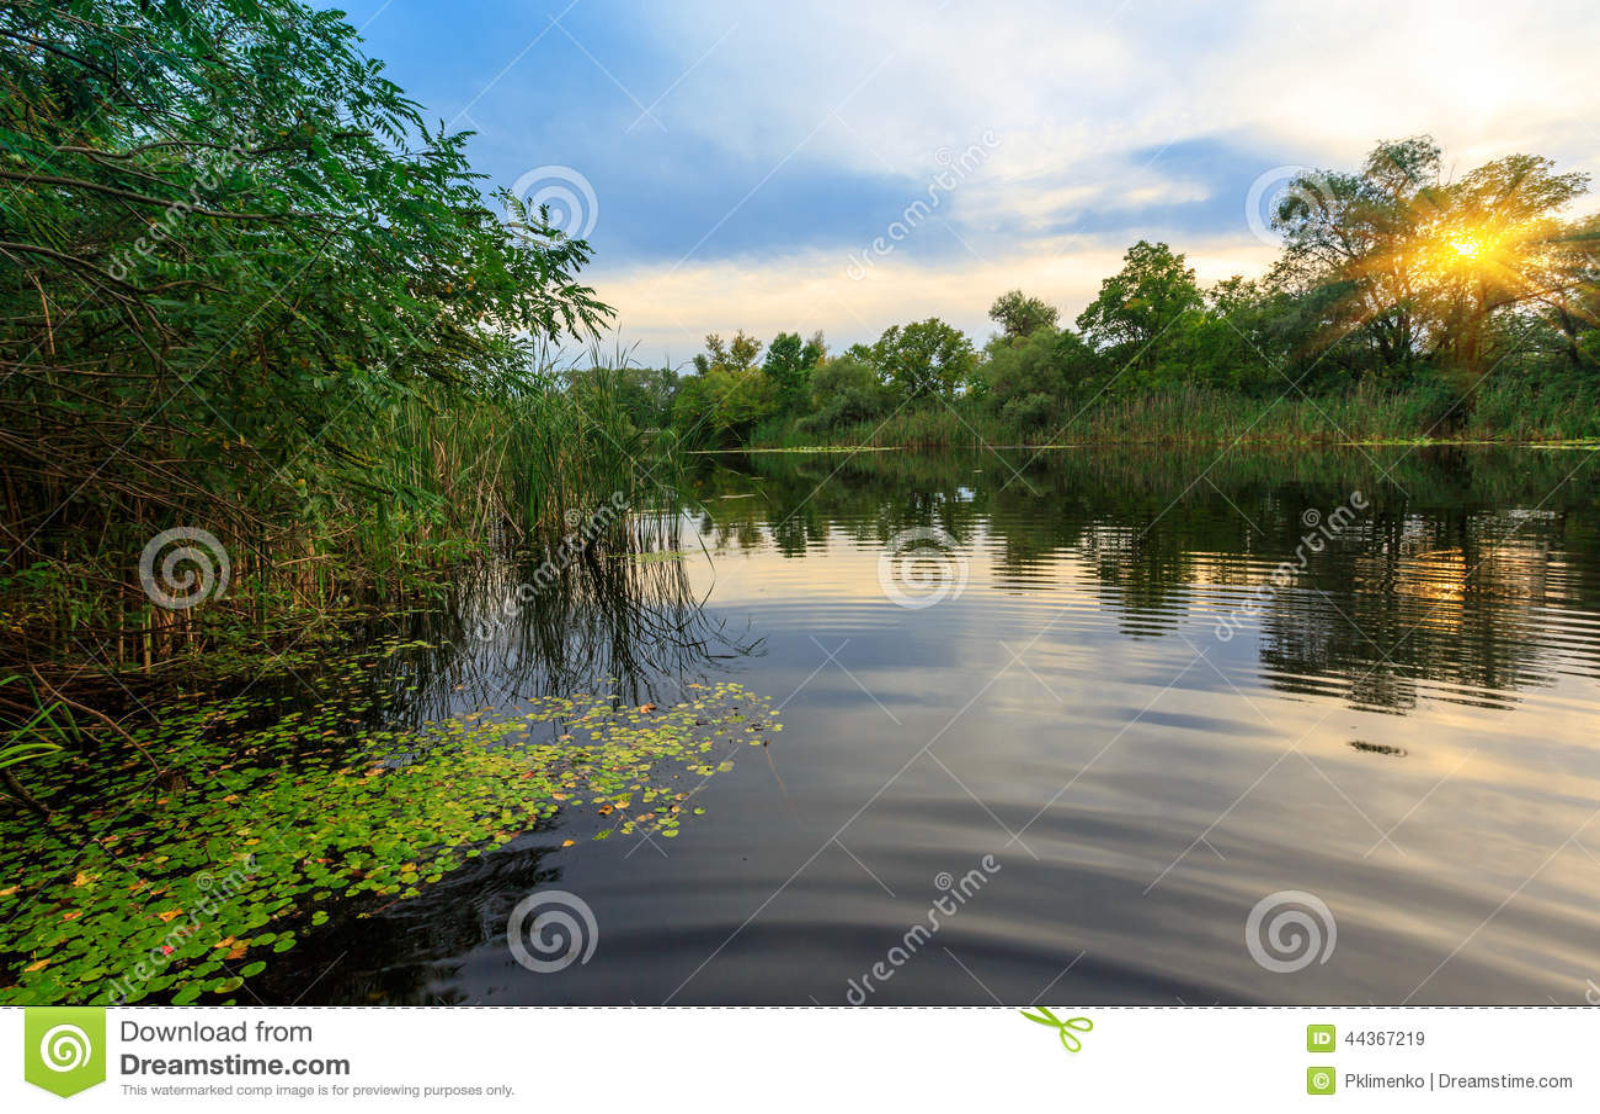 Scena di Enening sul fiume